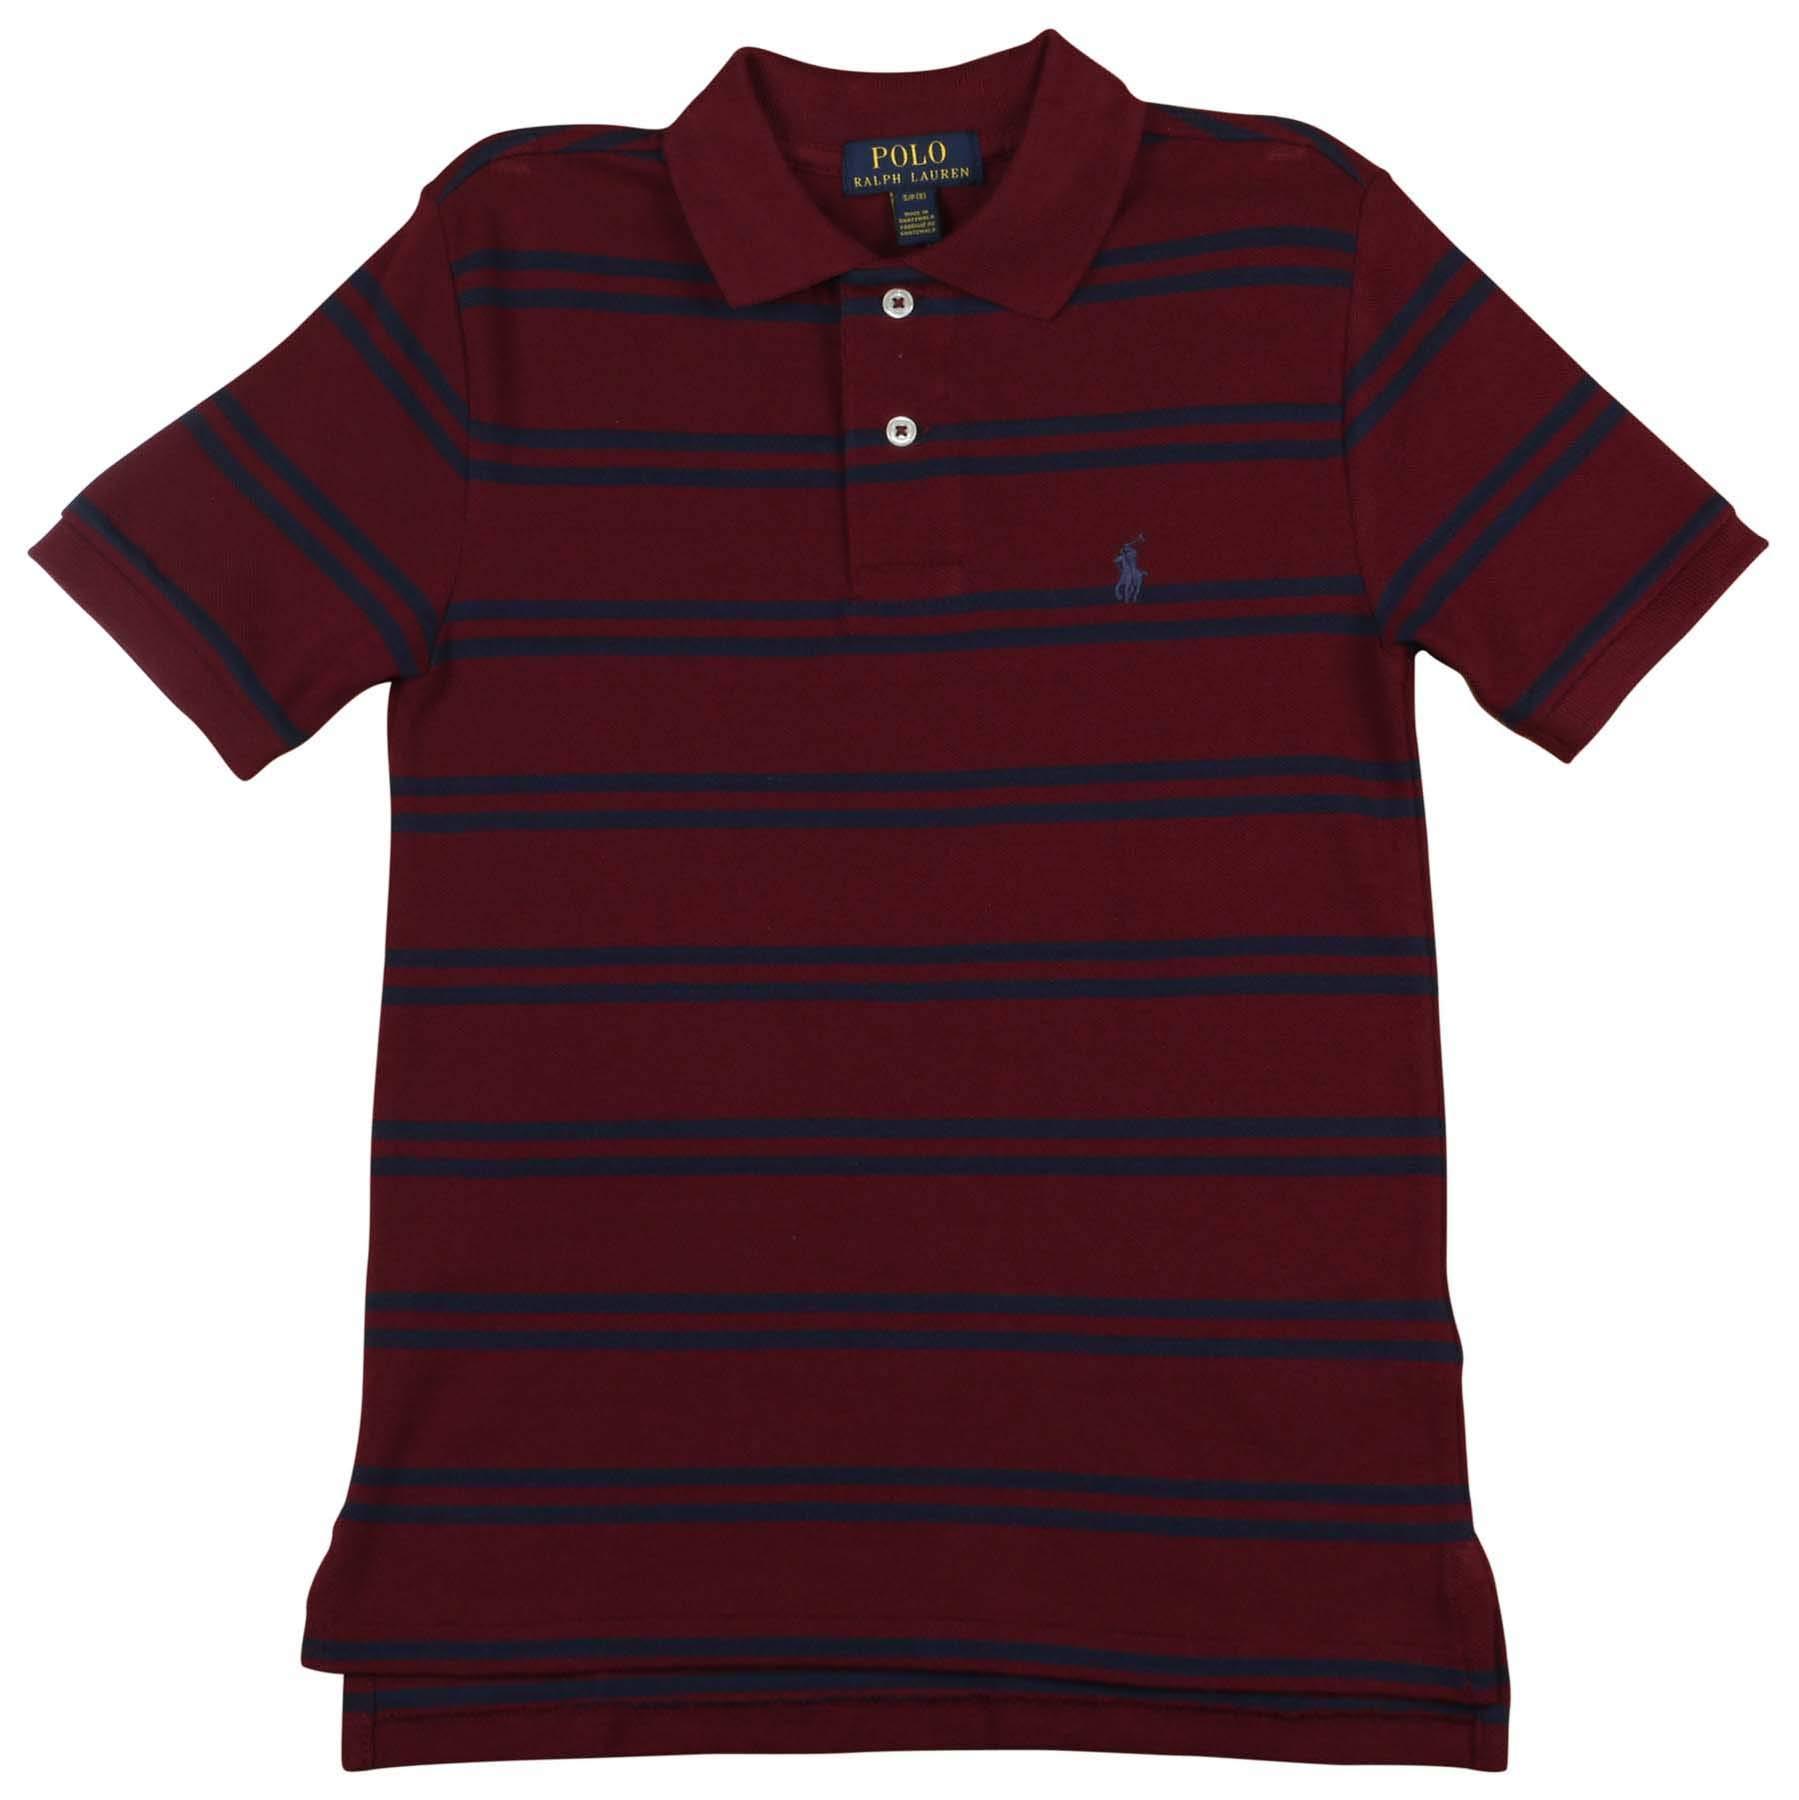 Polo RL Big Boy's (8-20) Striped Mesh Polo Shirt (Large (14-16), Red/Navy)